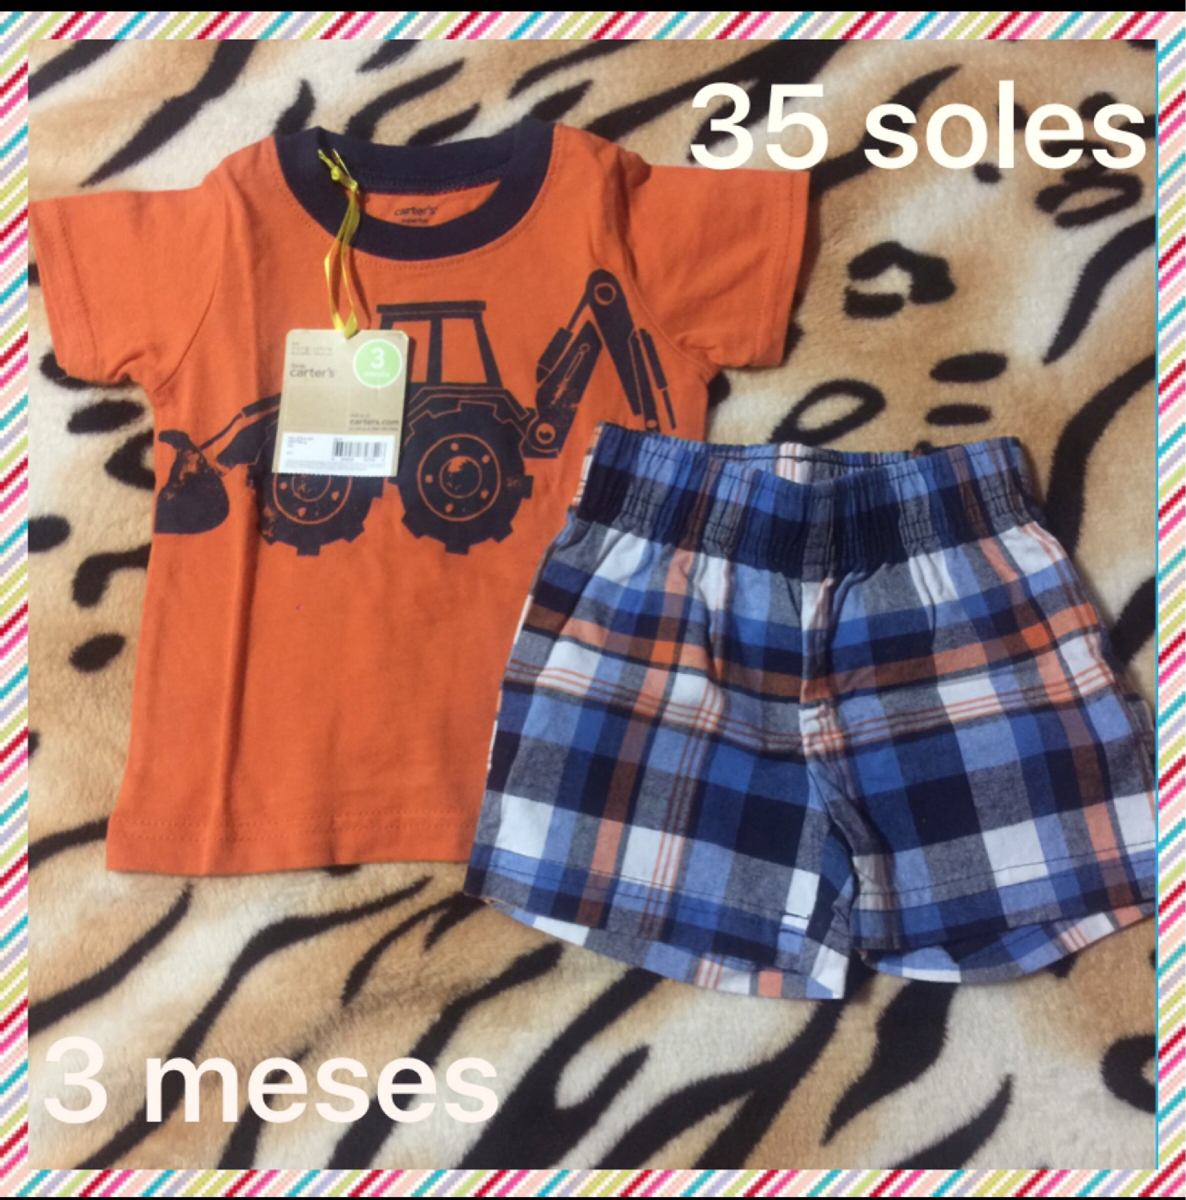 cfc384c4fa3 remato - ropa bebe prematuro   rn   0-3 meses - ver precios. Cargando zoom.